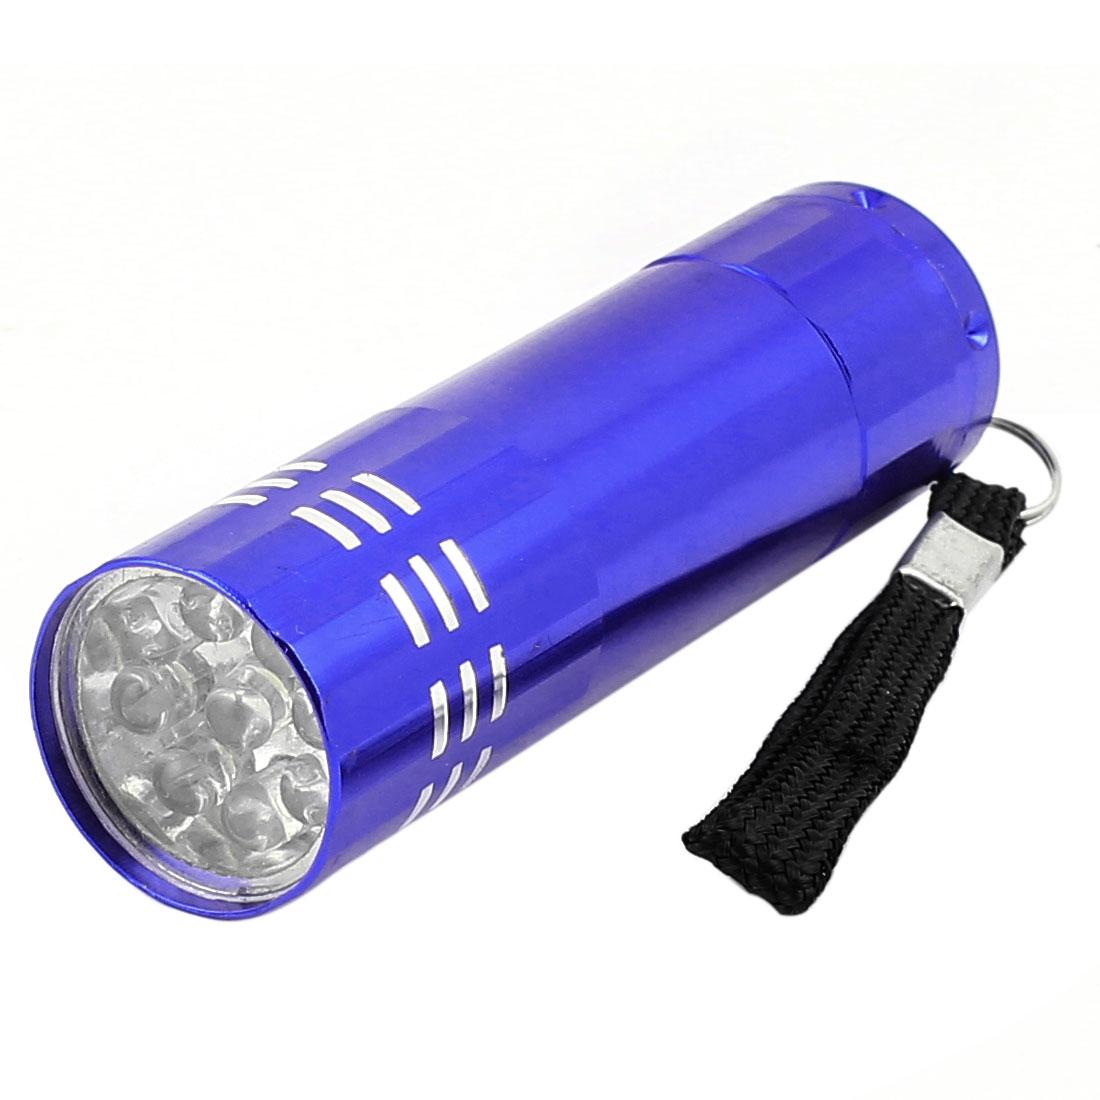 Home Camping Aluminium Alloy Shell 9-LED White Light Flashlight Torch Lamp